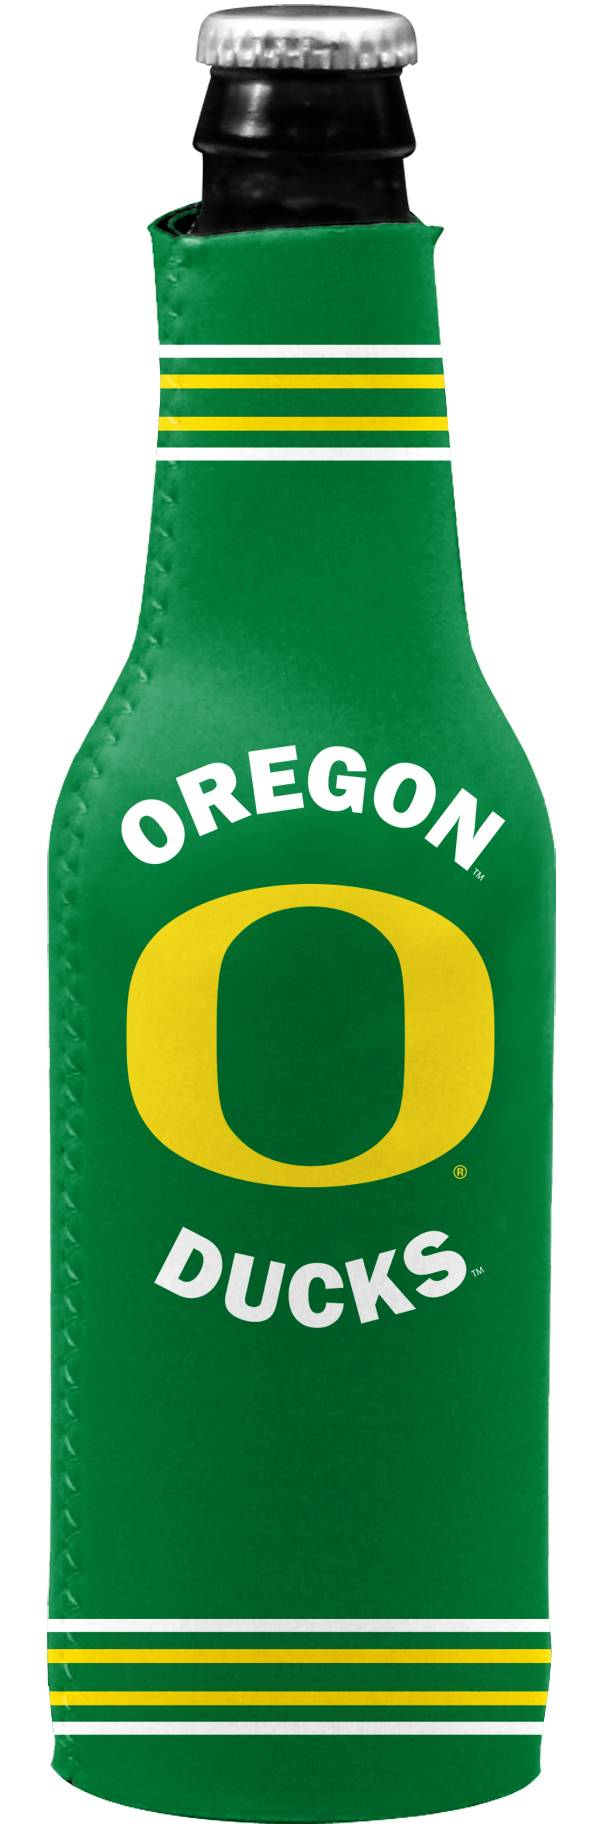 Oregon Ducks Bottle Koozie product image